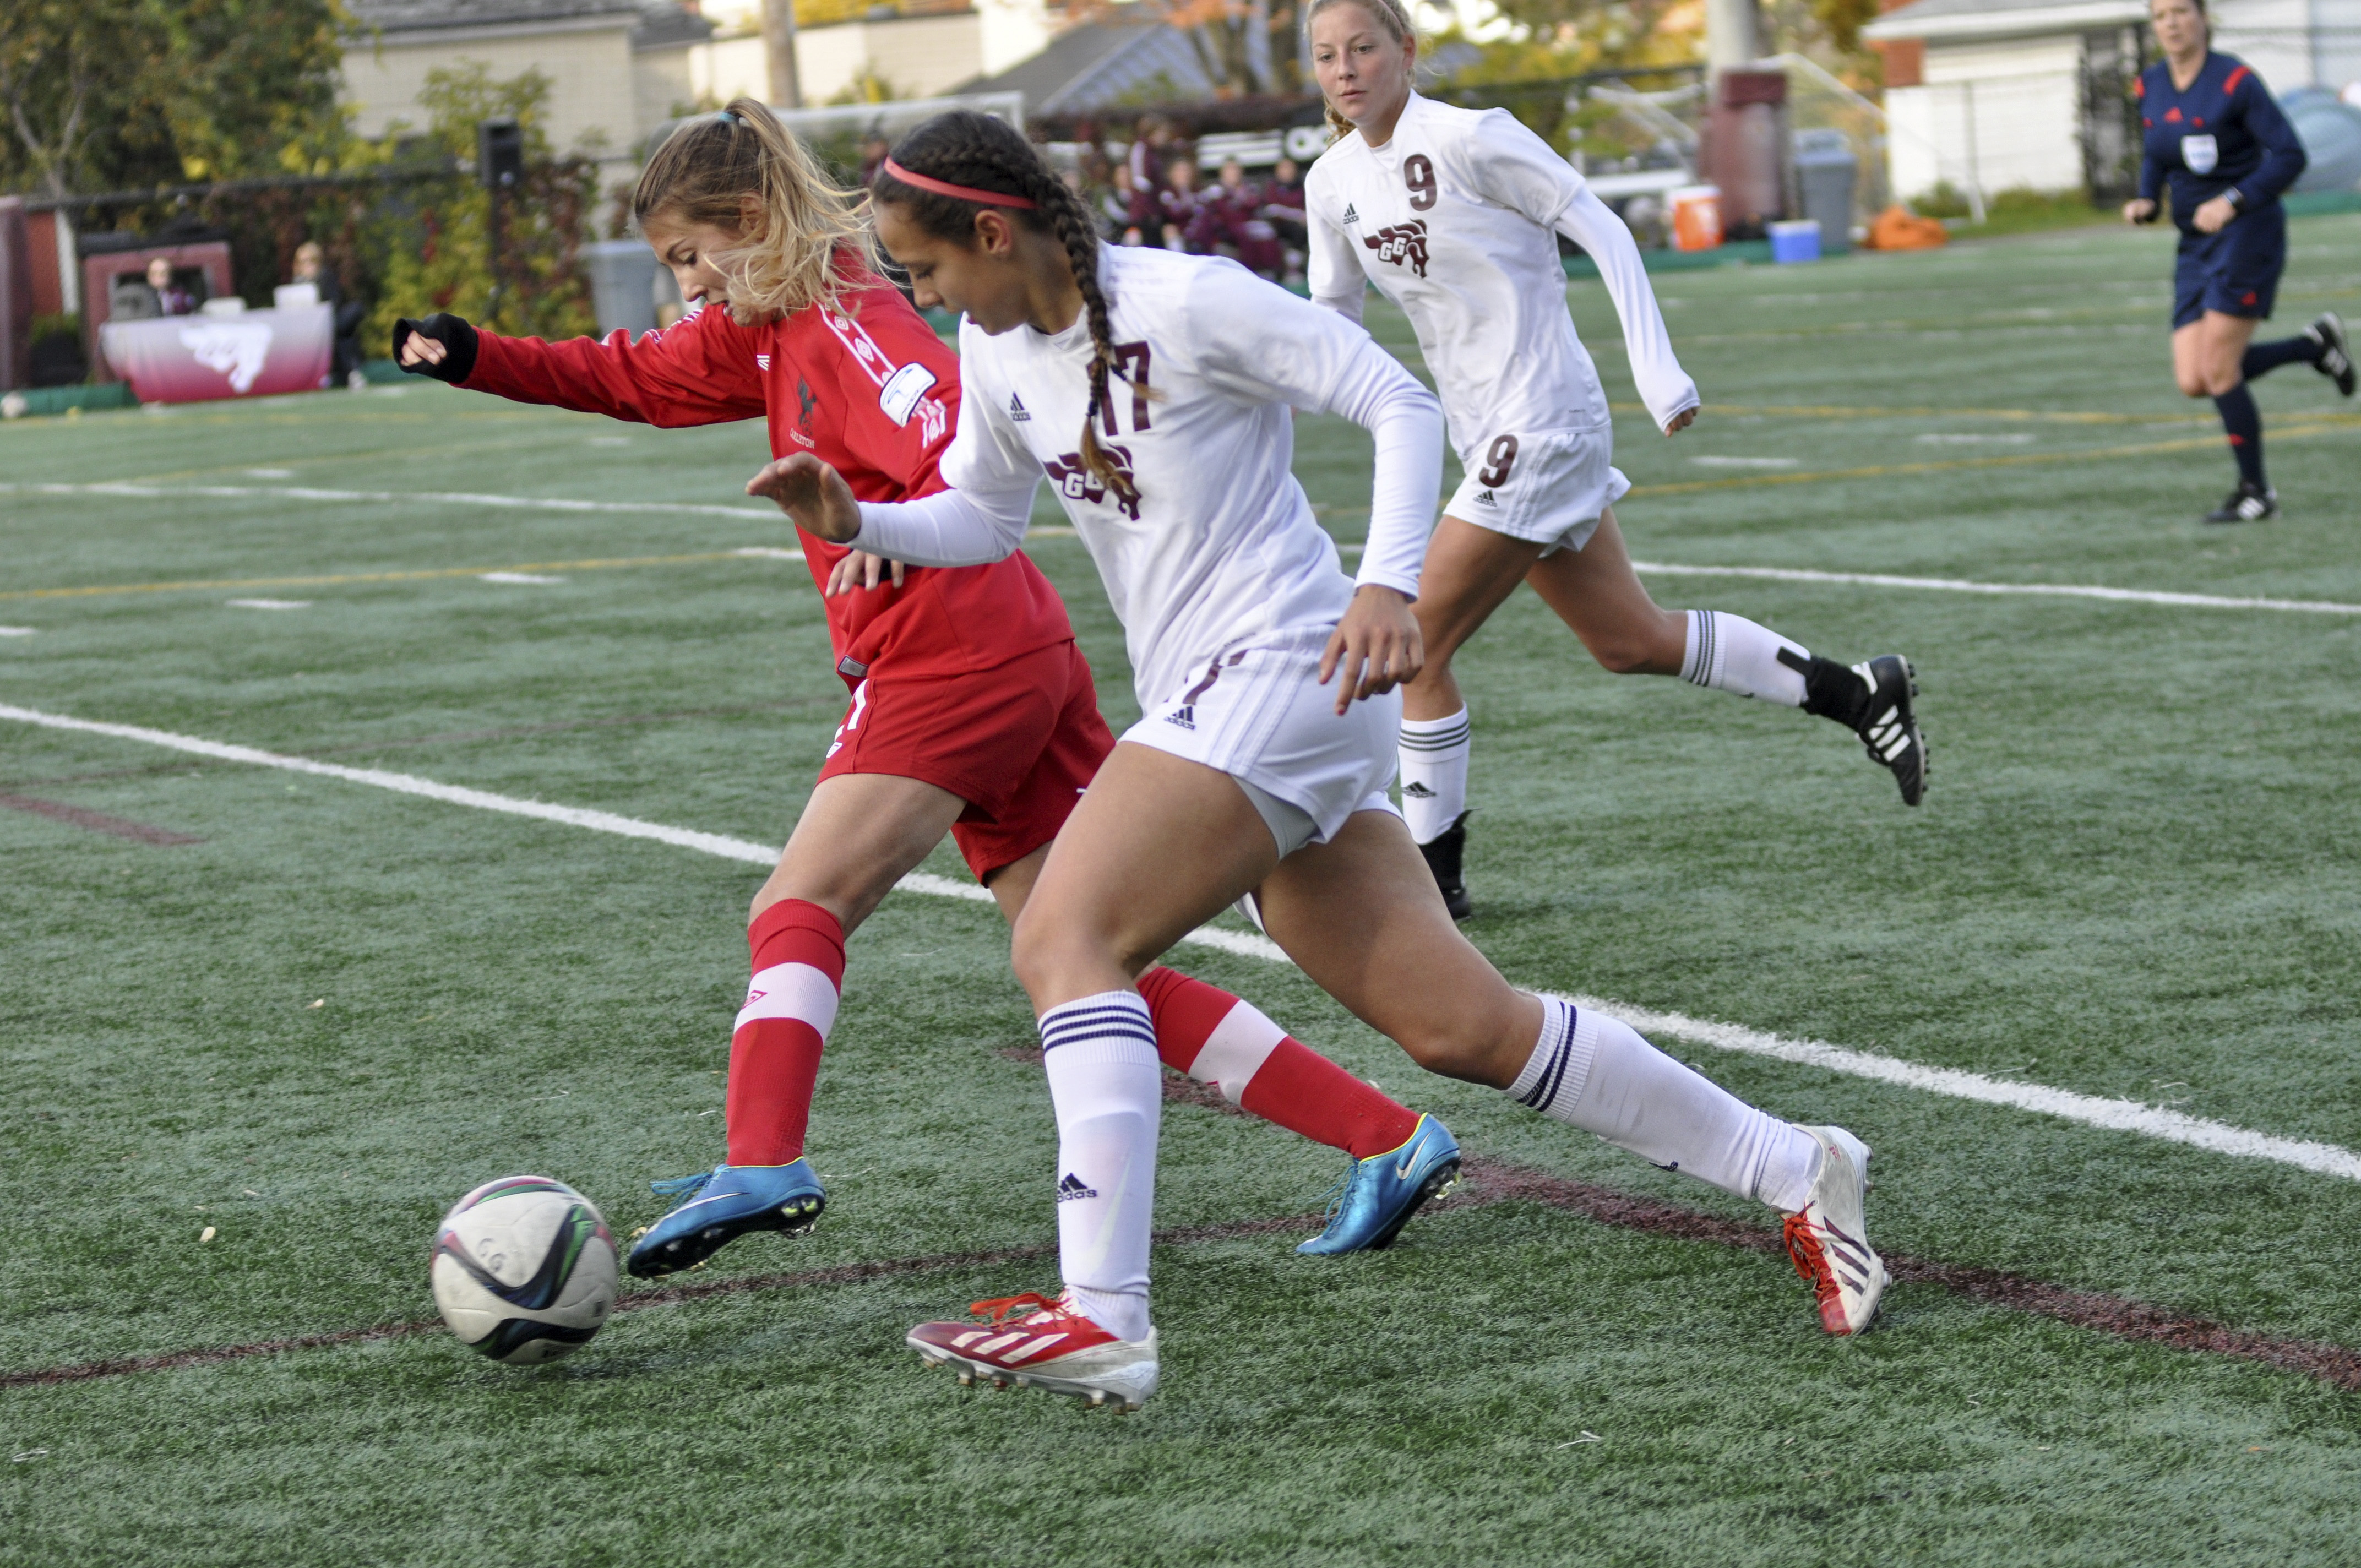 SPORTS_Soccer v Carleton_cred_Marta Kierkus